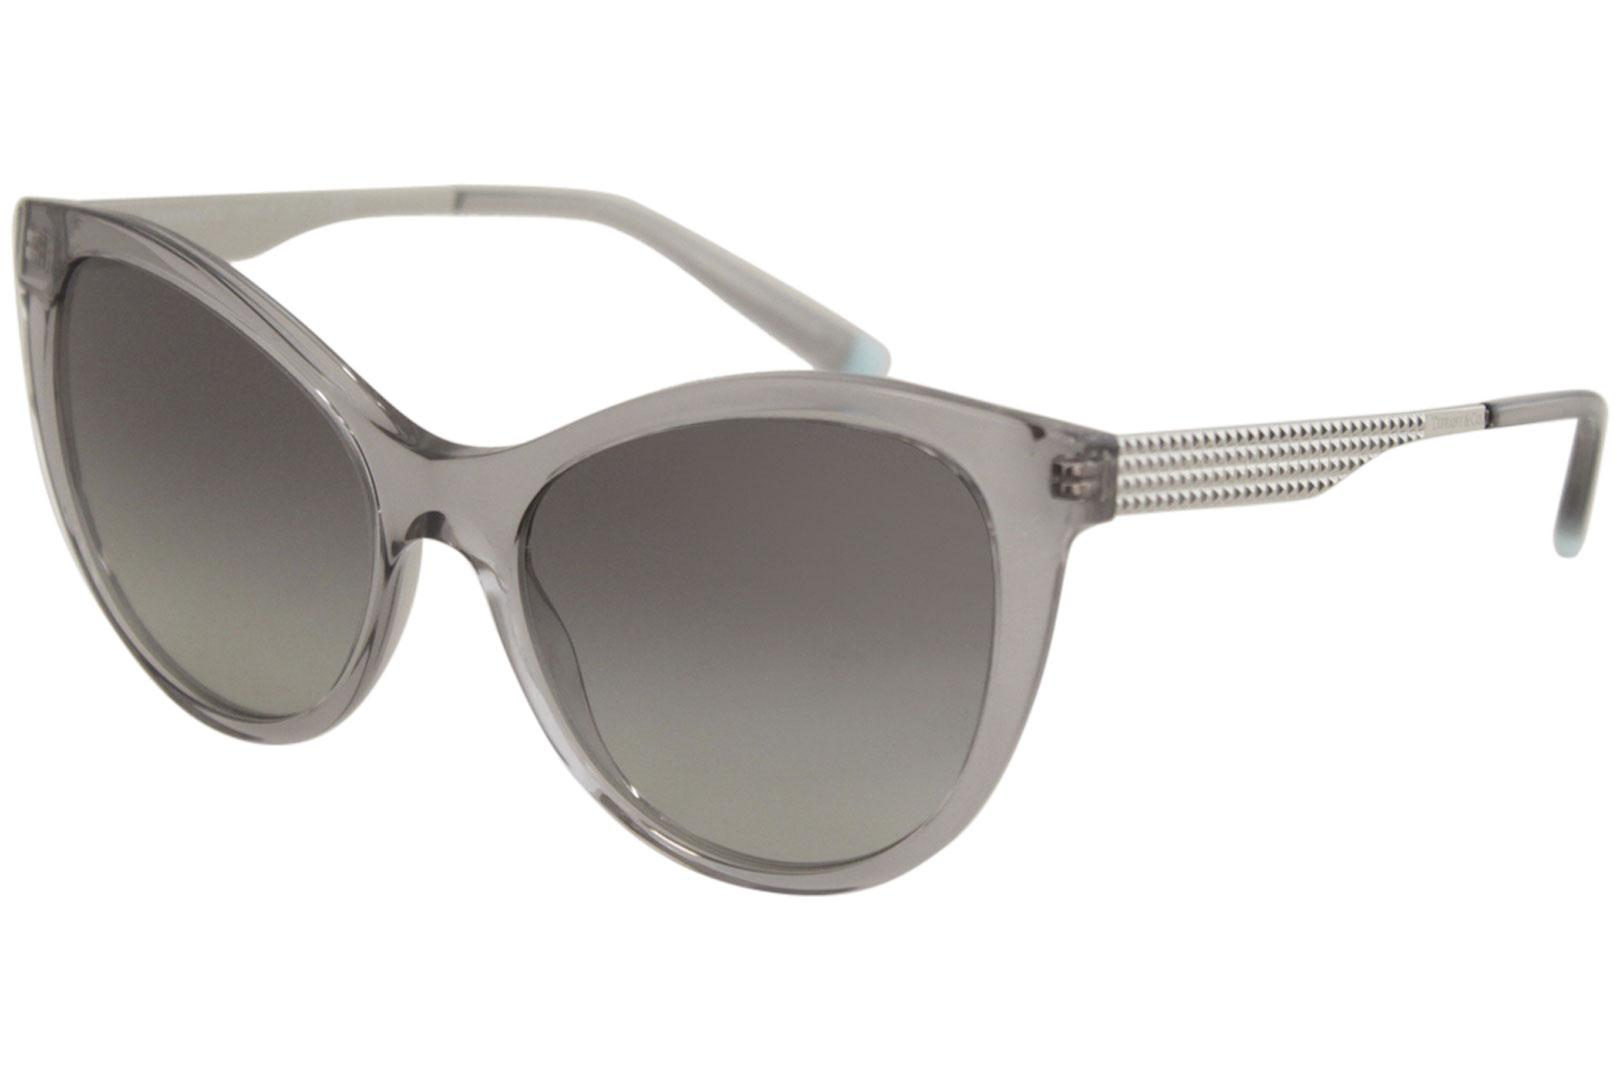 8f9c4e3e9a0f8 Tiffany   Co. Women s TF4159 TF 4159 Fashion Cat Eye Sunglasses by Tiffany    Co.